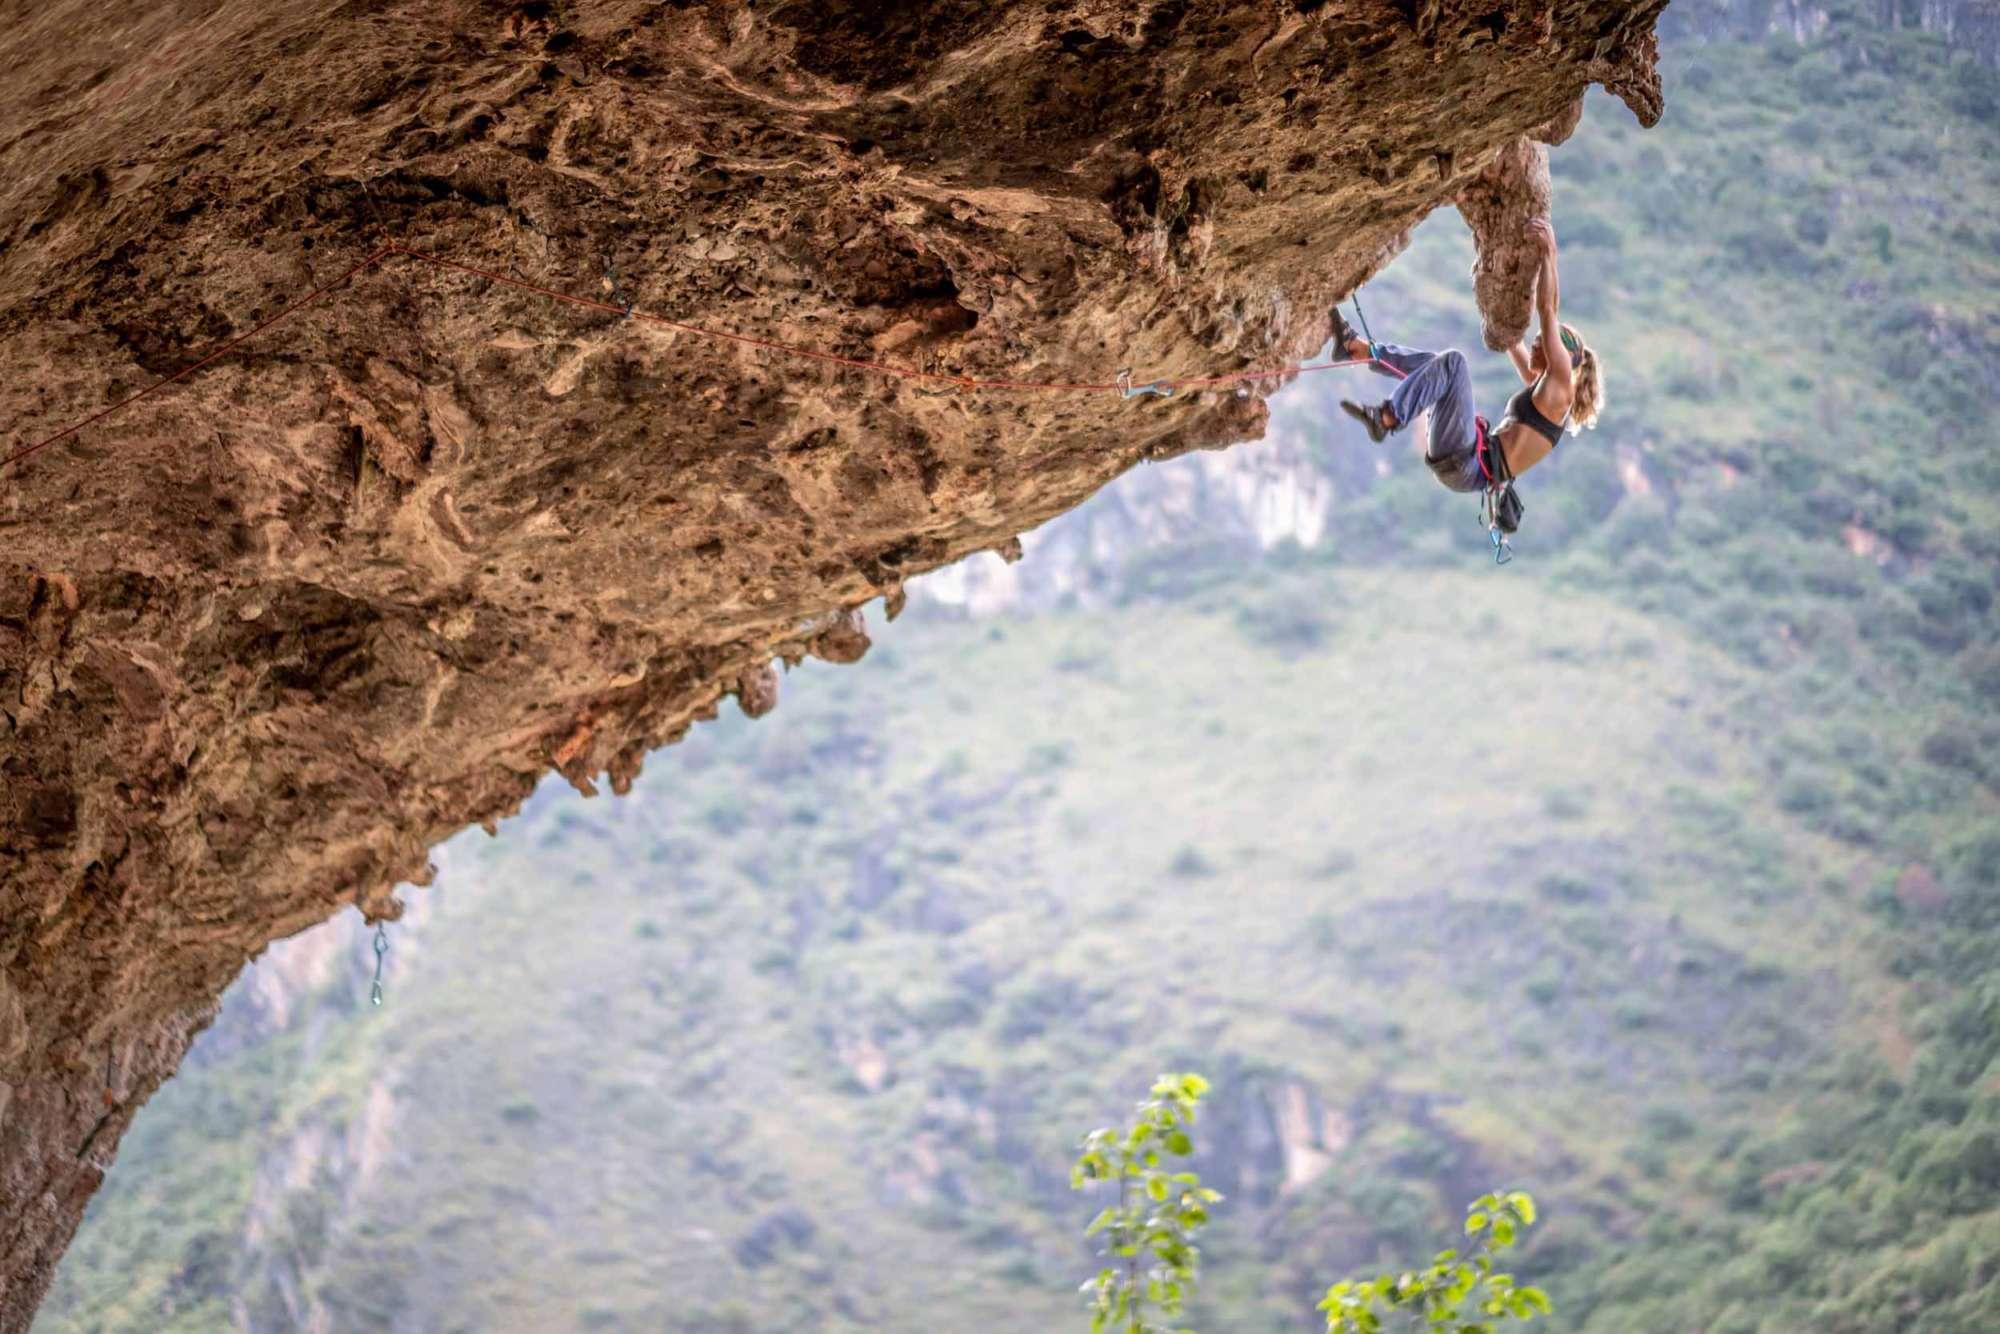 mountain-climbers-soaring-to-new-heights-photographer-Julian-Reinhold-vie-en-montagne-Emilie-Pellerin